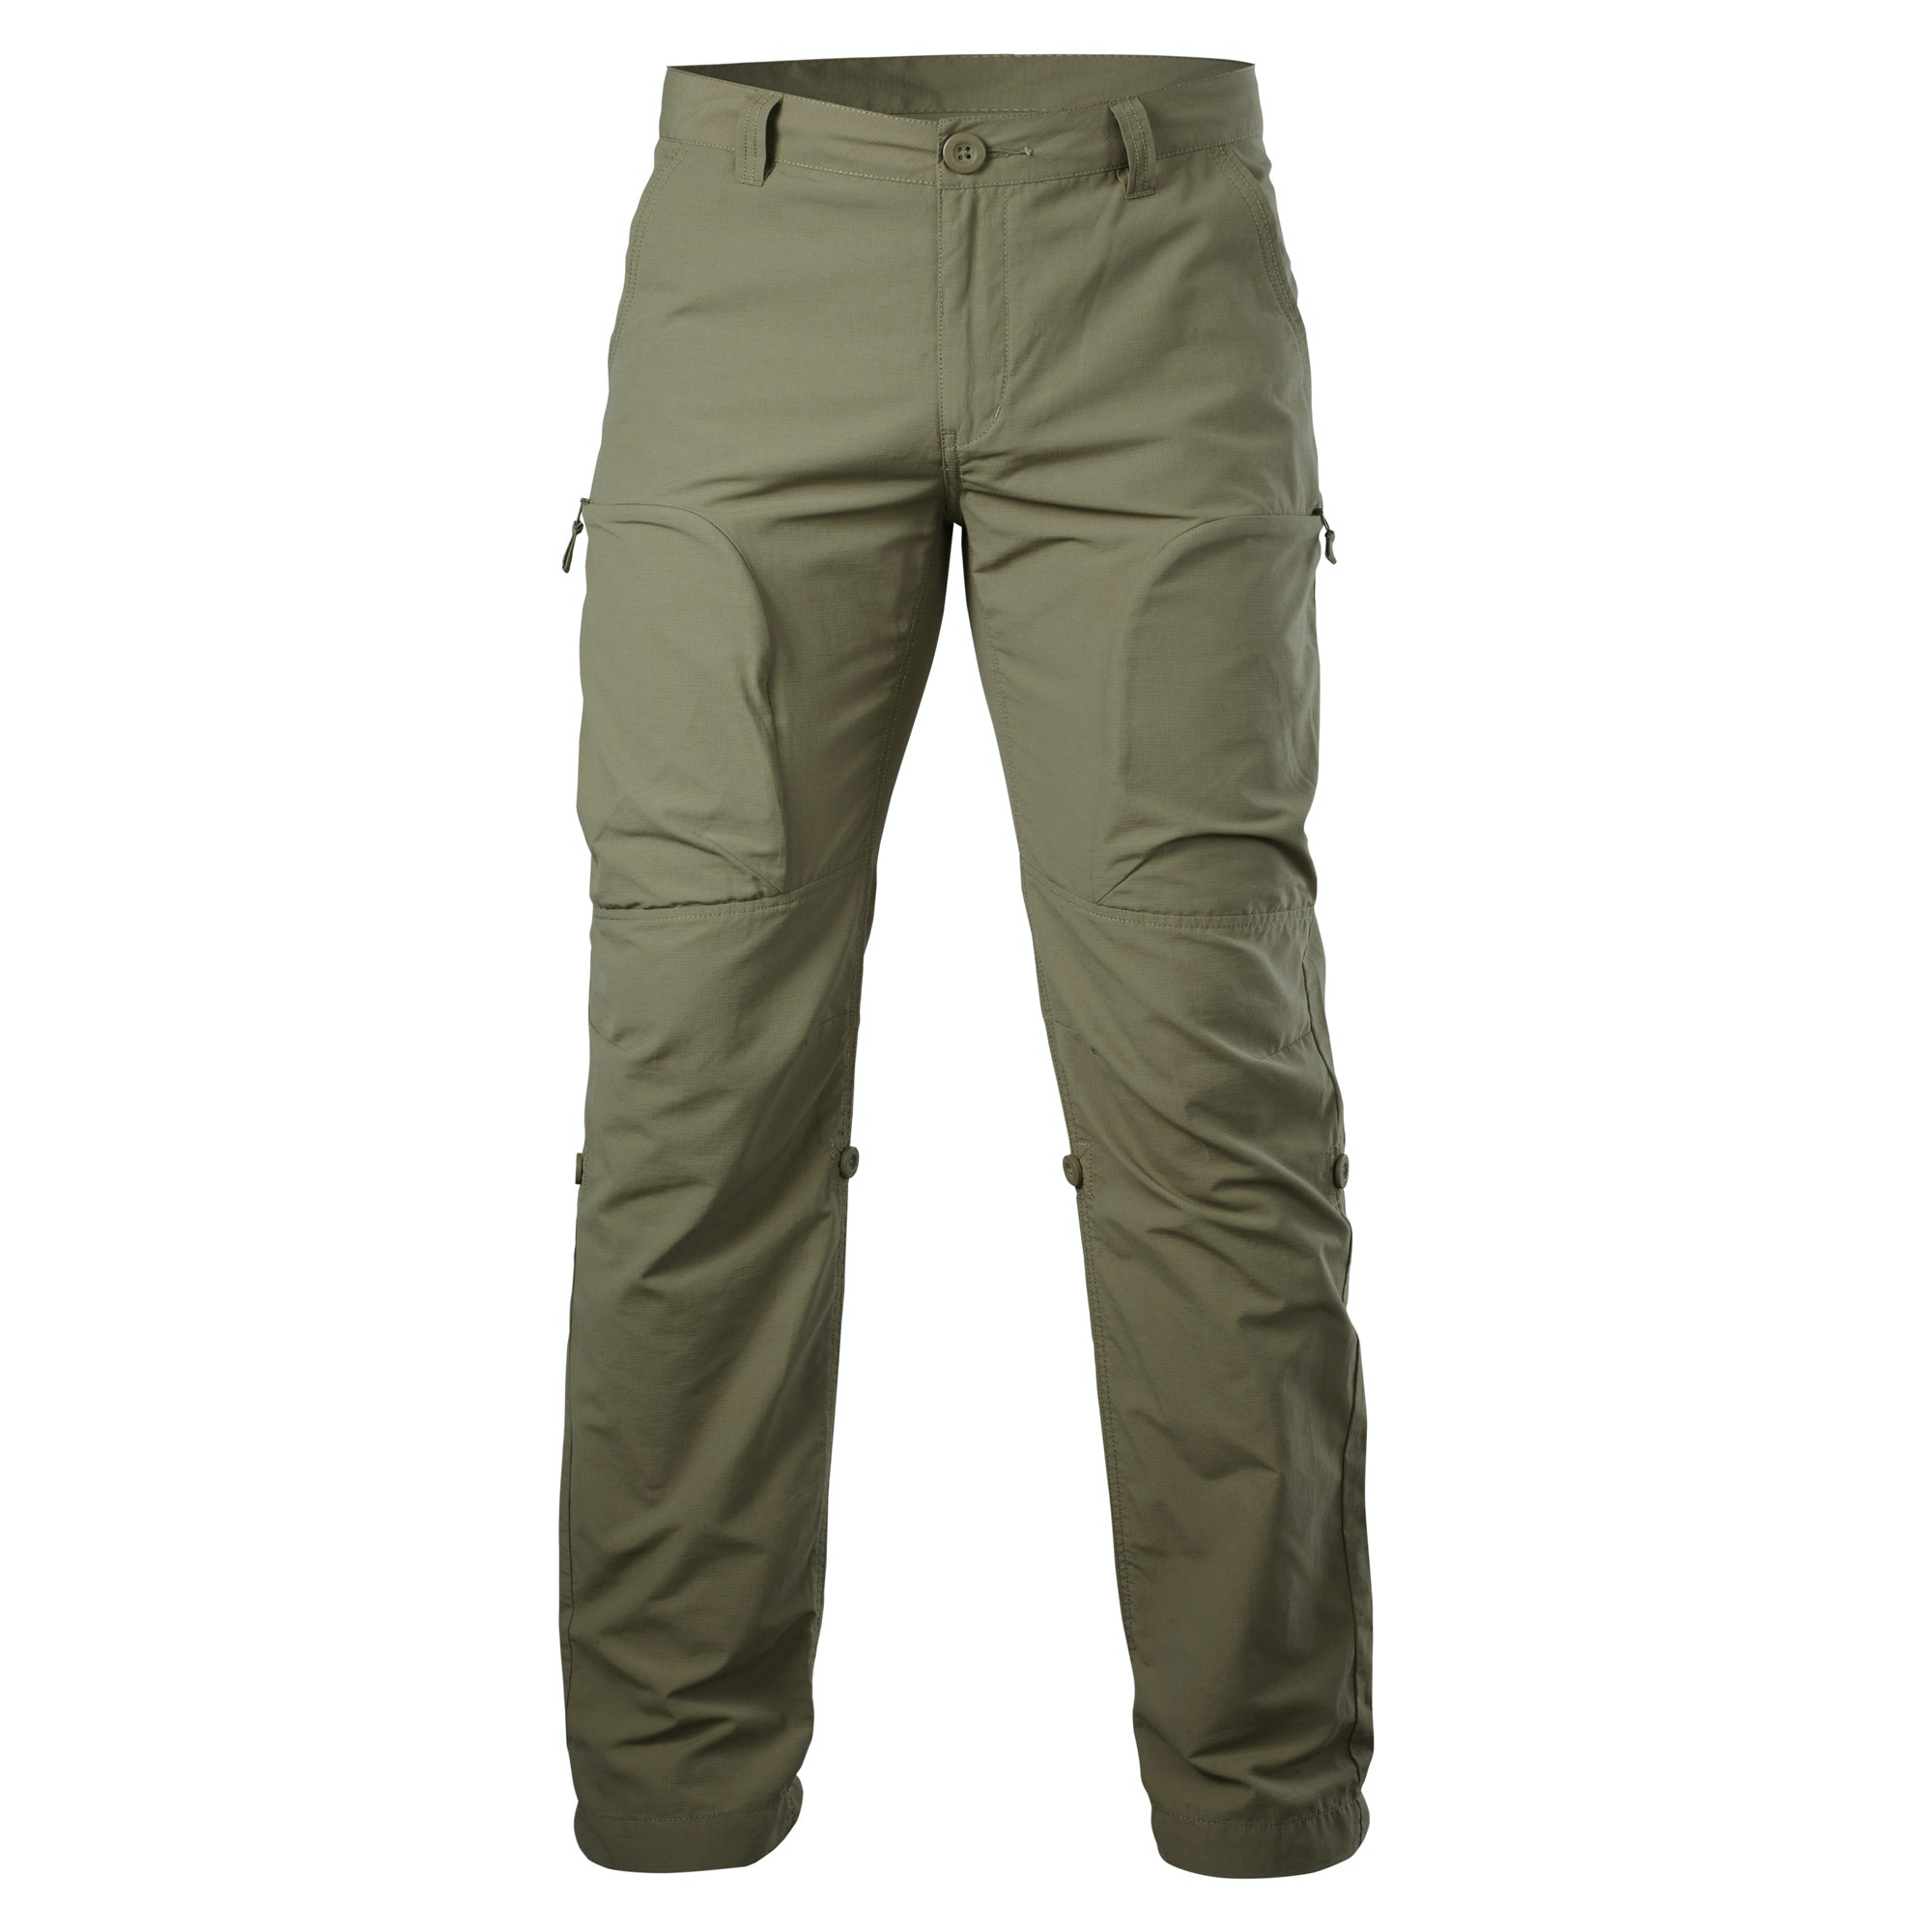 kathmandu cardeto mens cotton blend roll up travel pants trousers v2 green ebay